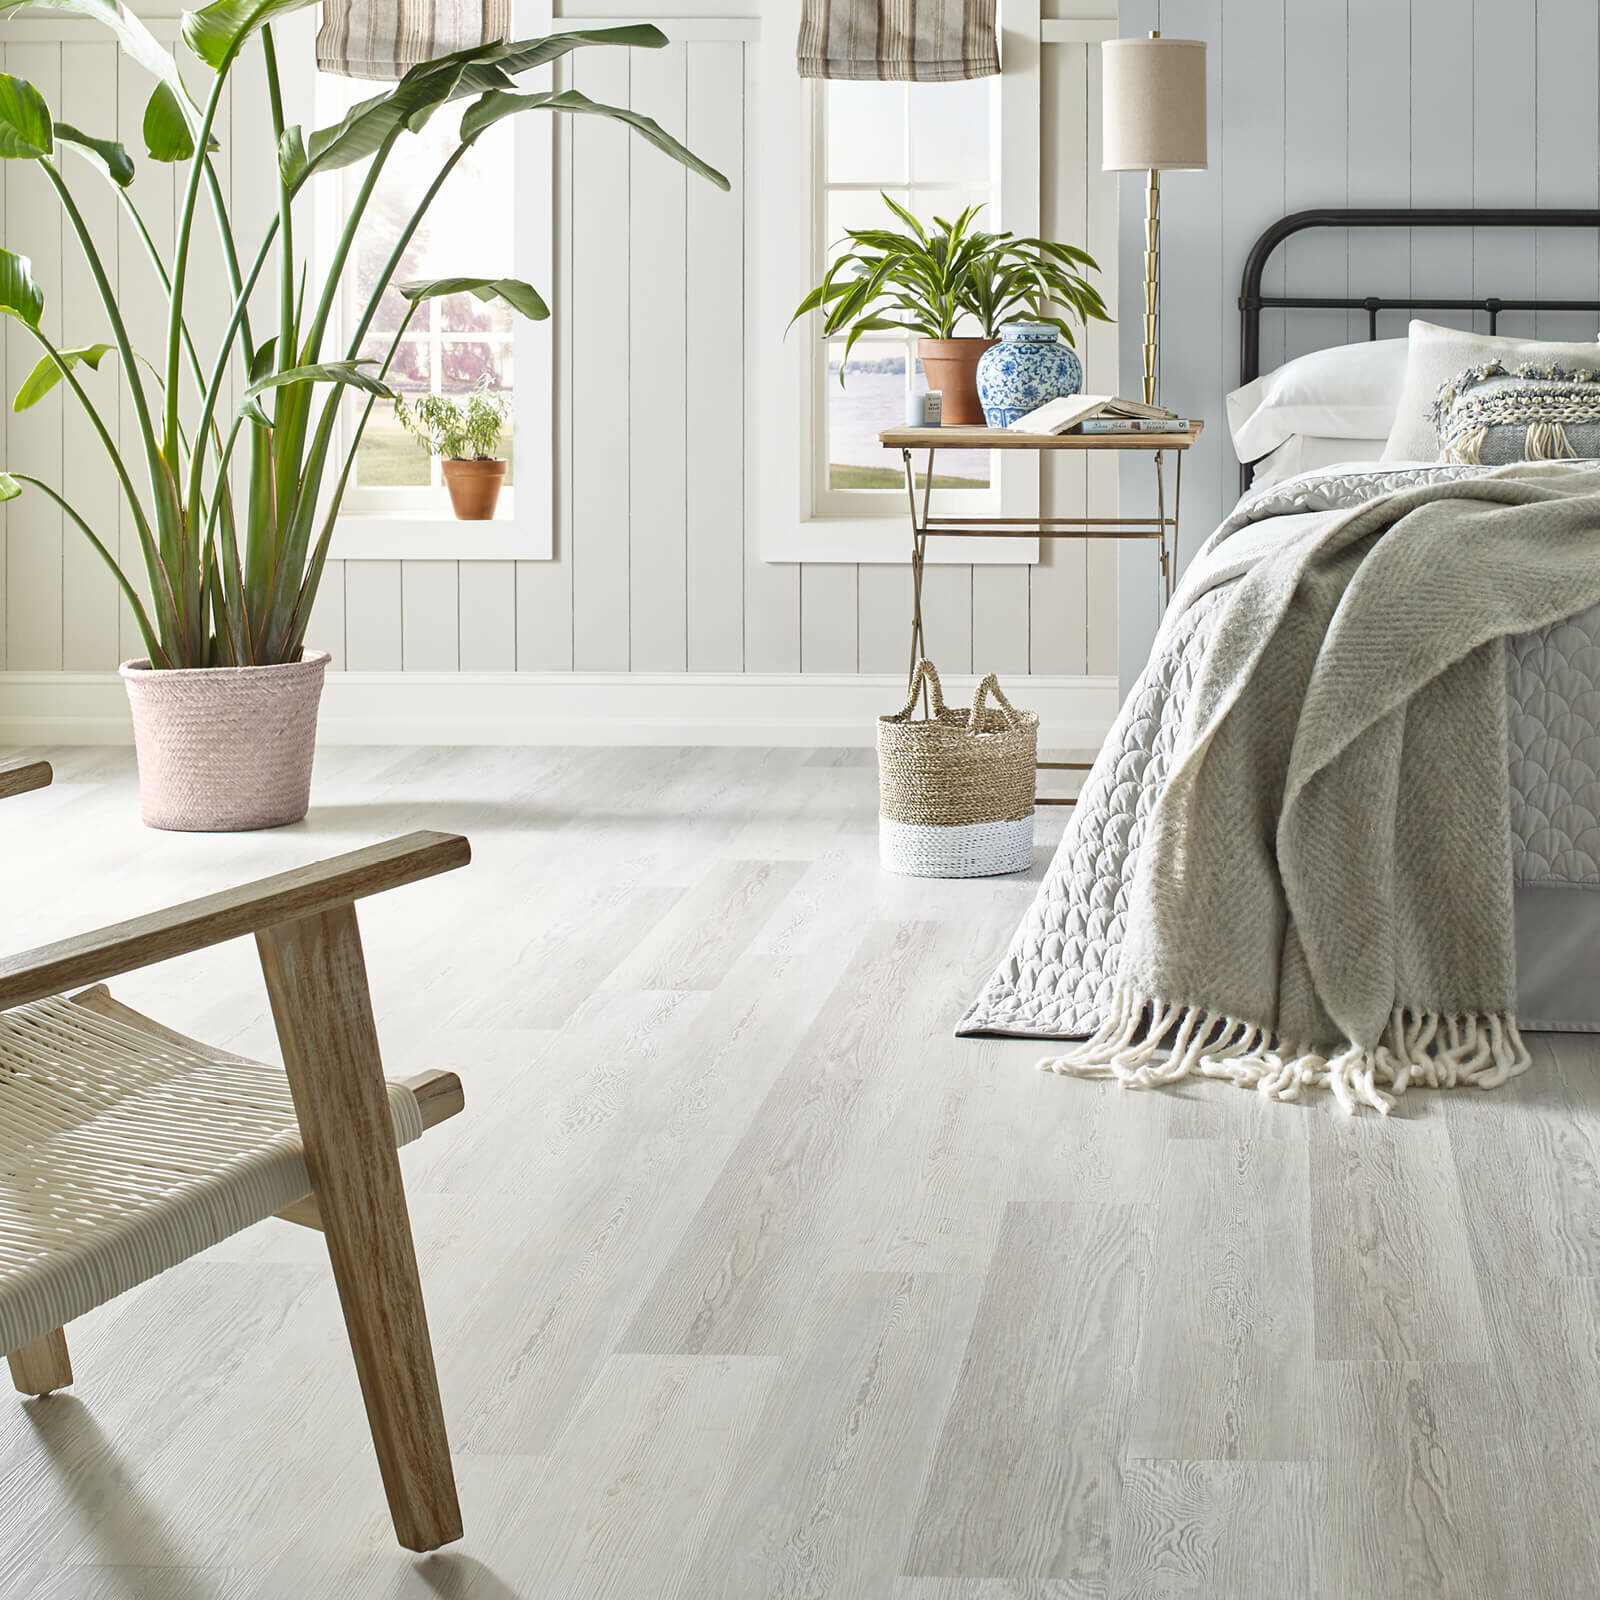 Bedroom vinyl flooring | McCool's Flooring